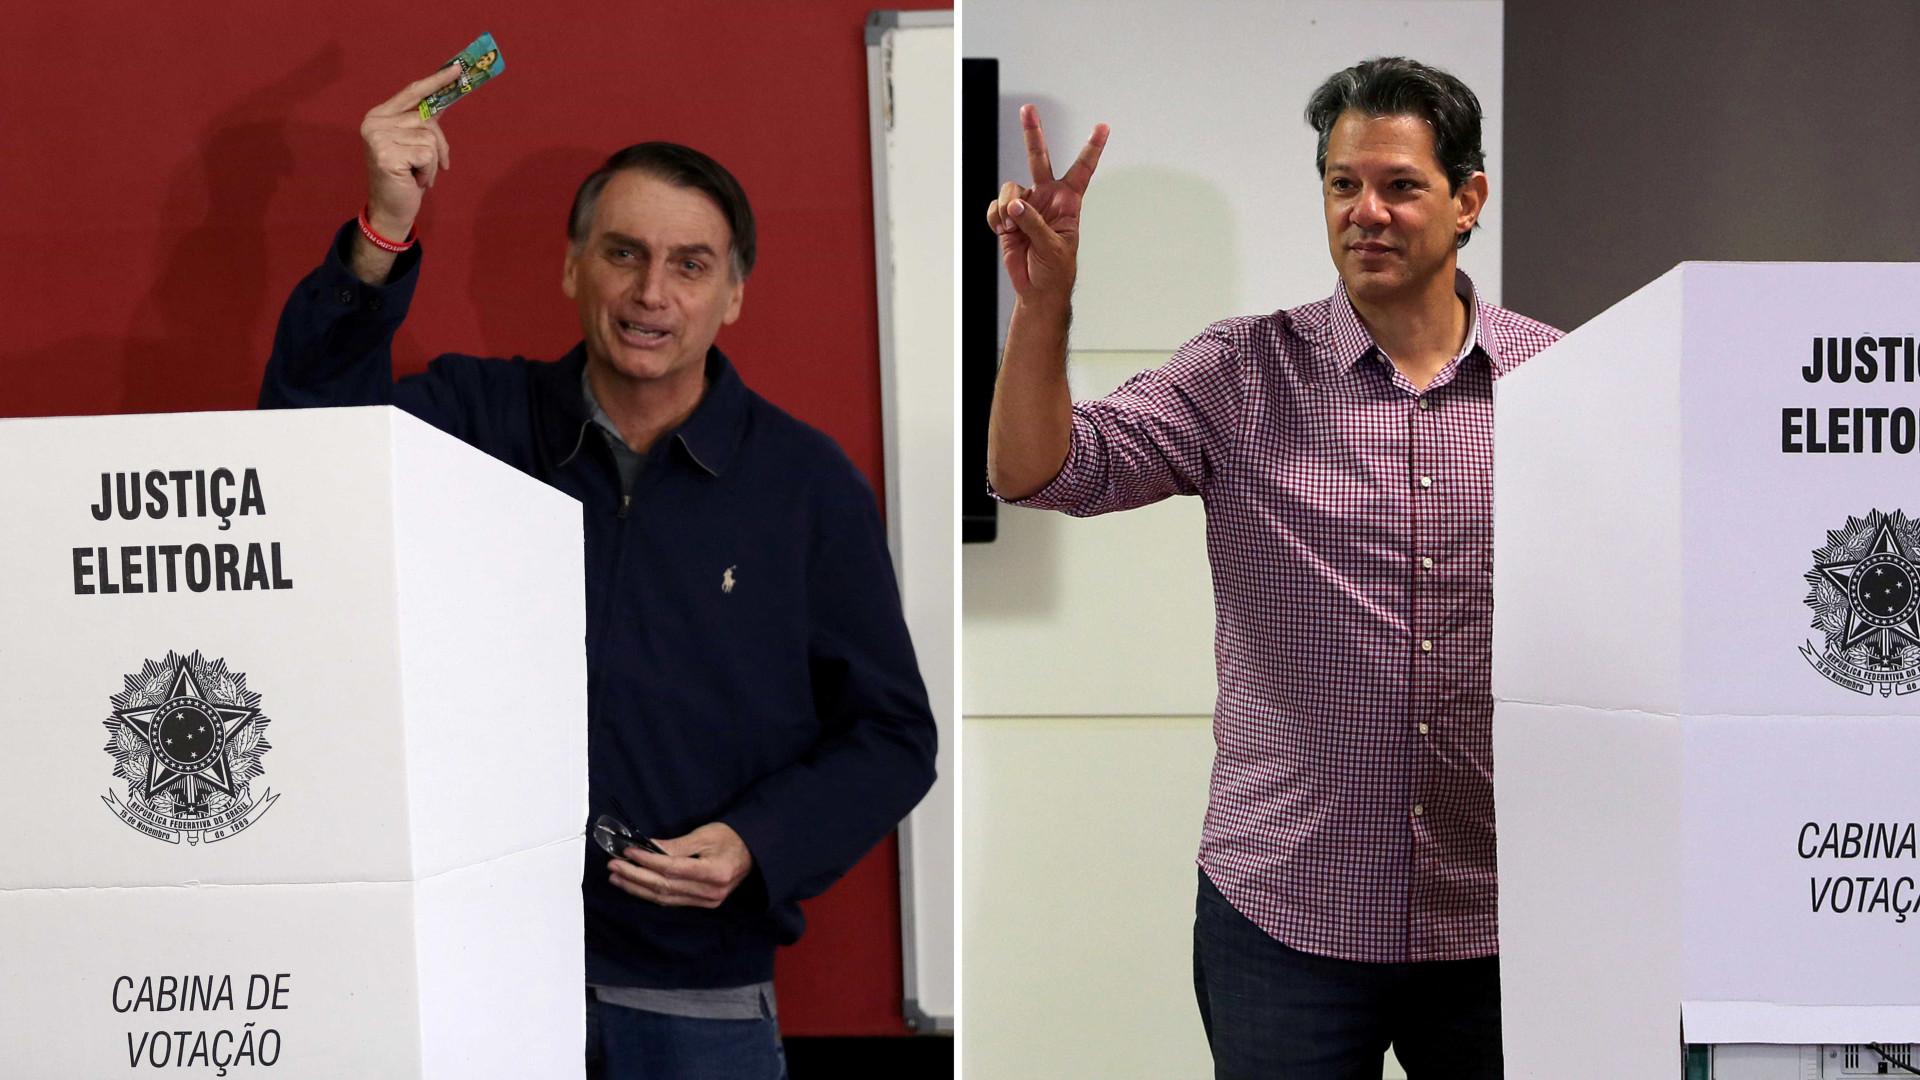 Saiba o que Bolsonaro e Haddad propõem para a economia